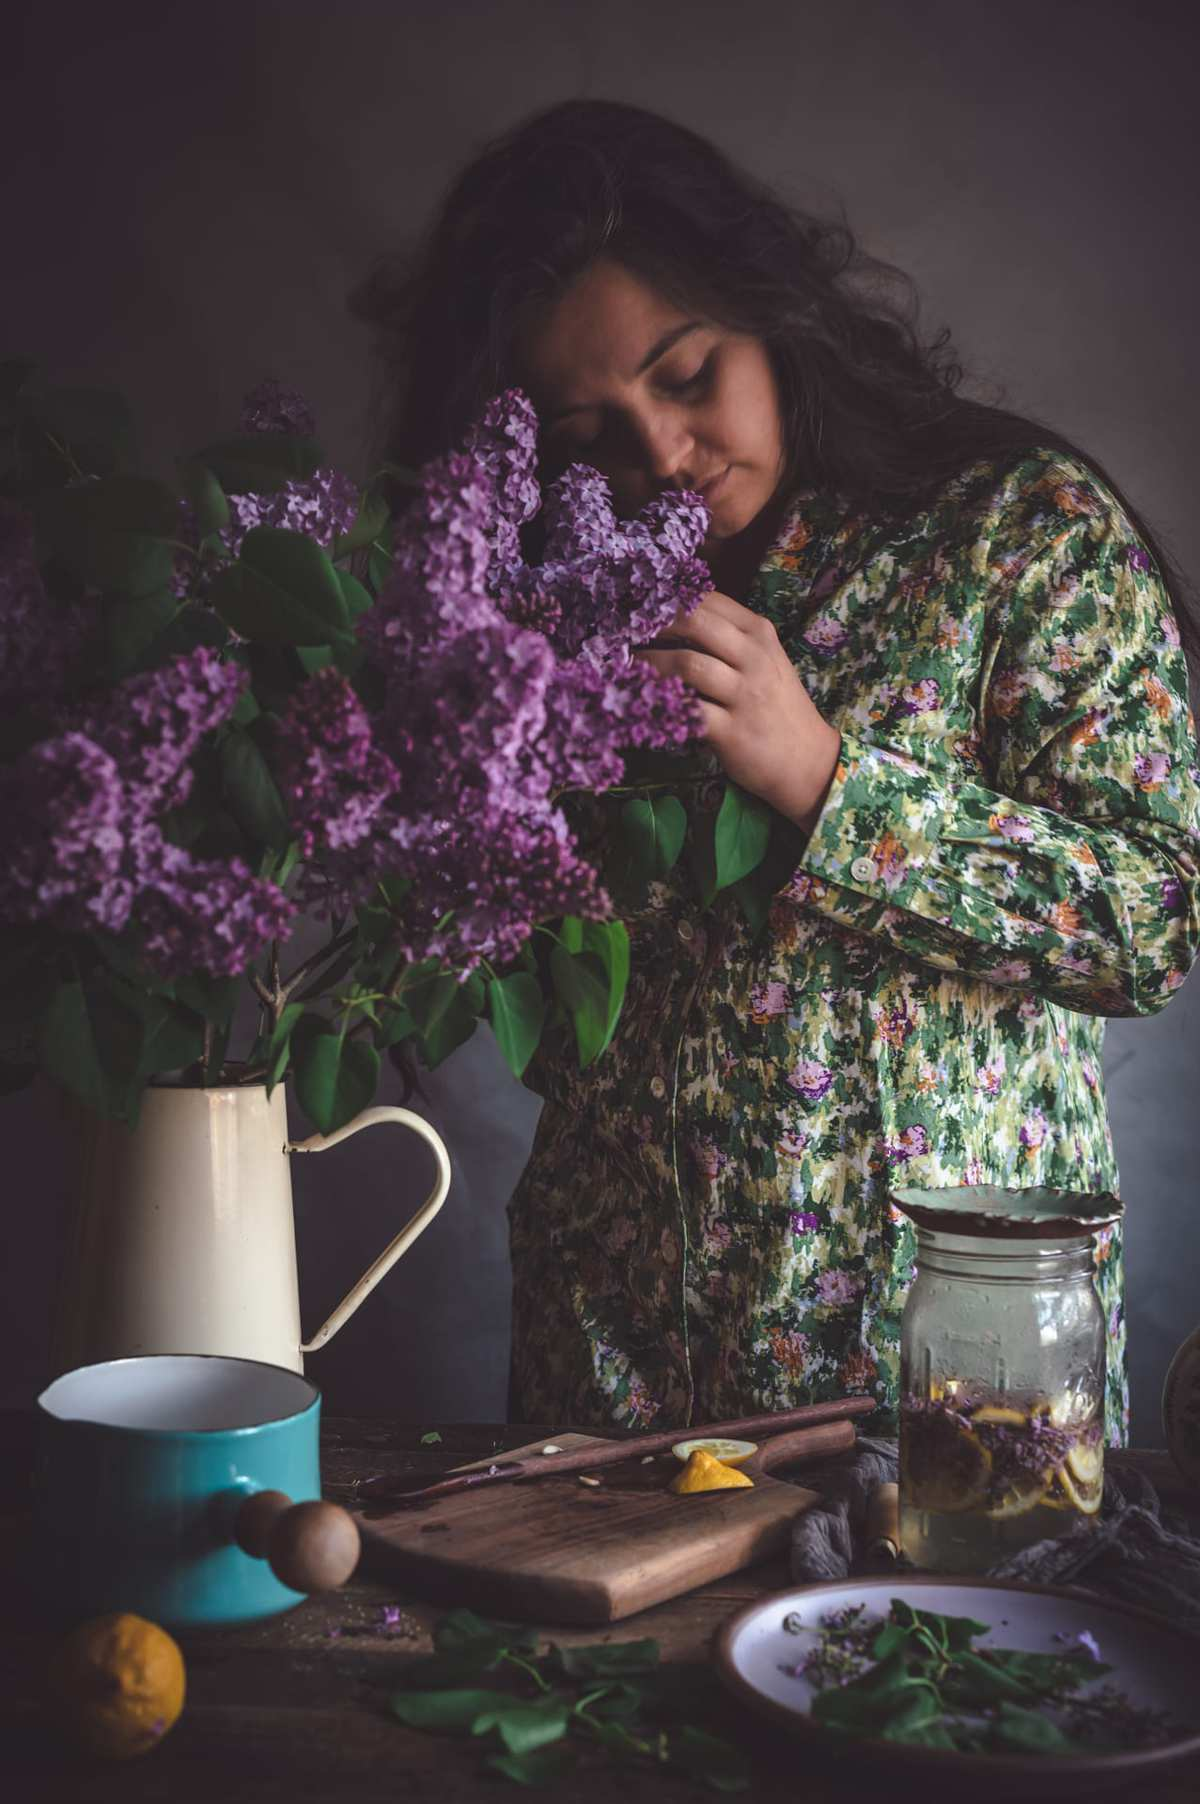 woman smelling lilacs